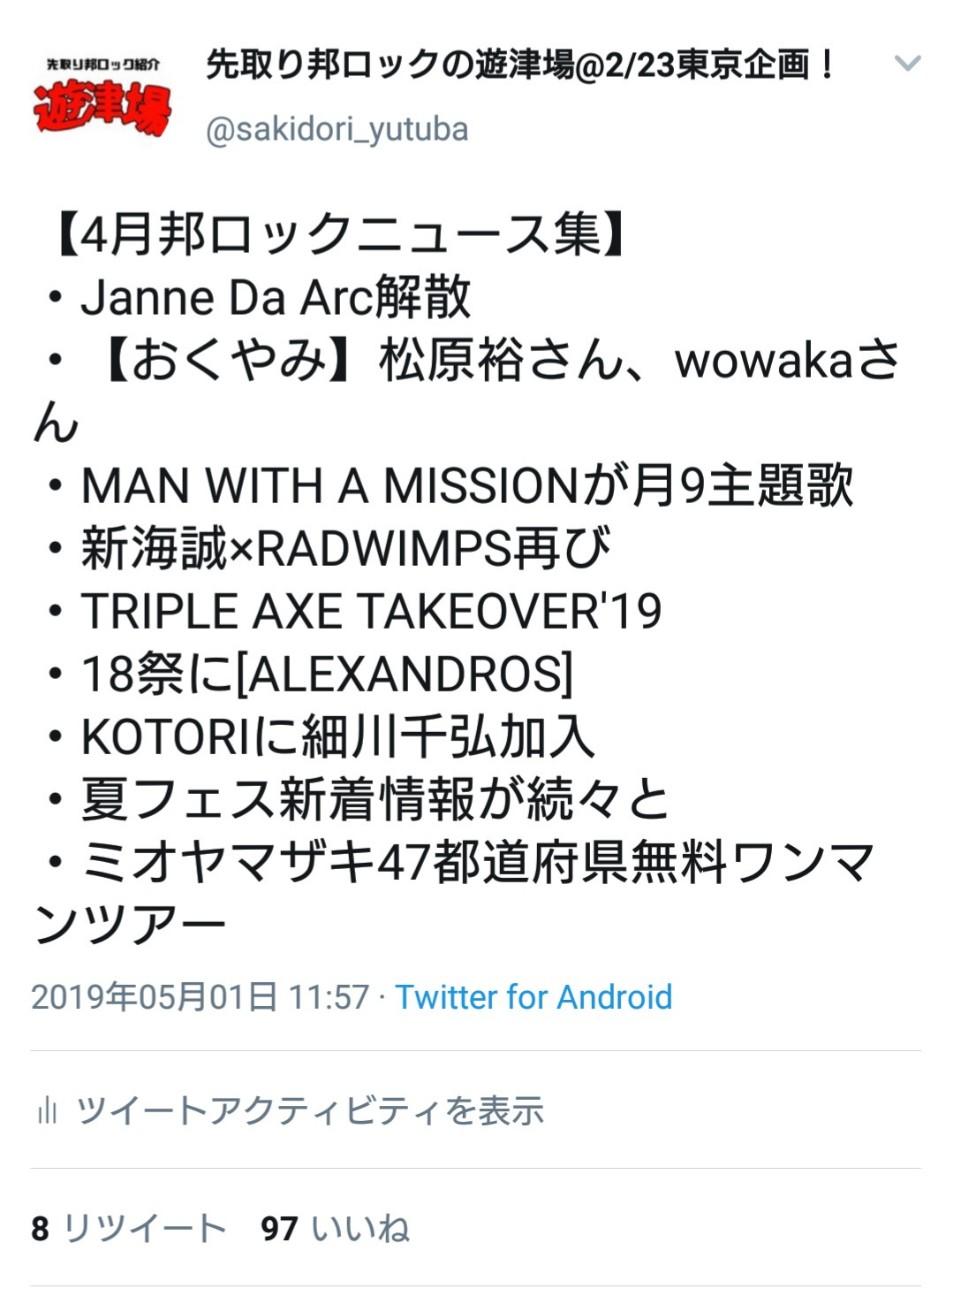 f:id:sakidoriyutsubarock:20191218005300j:plain